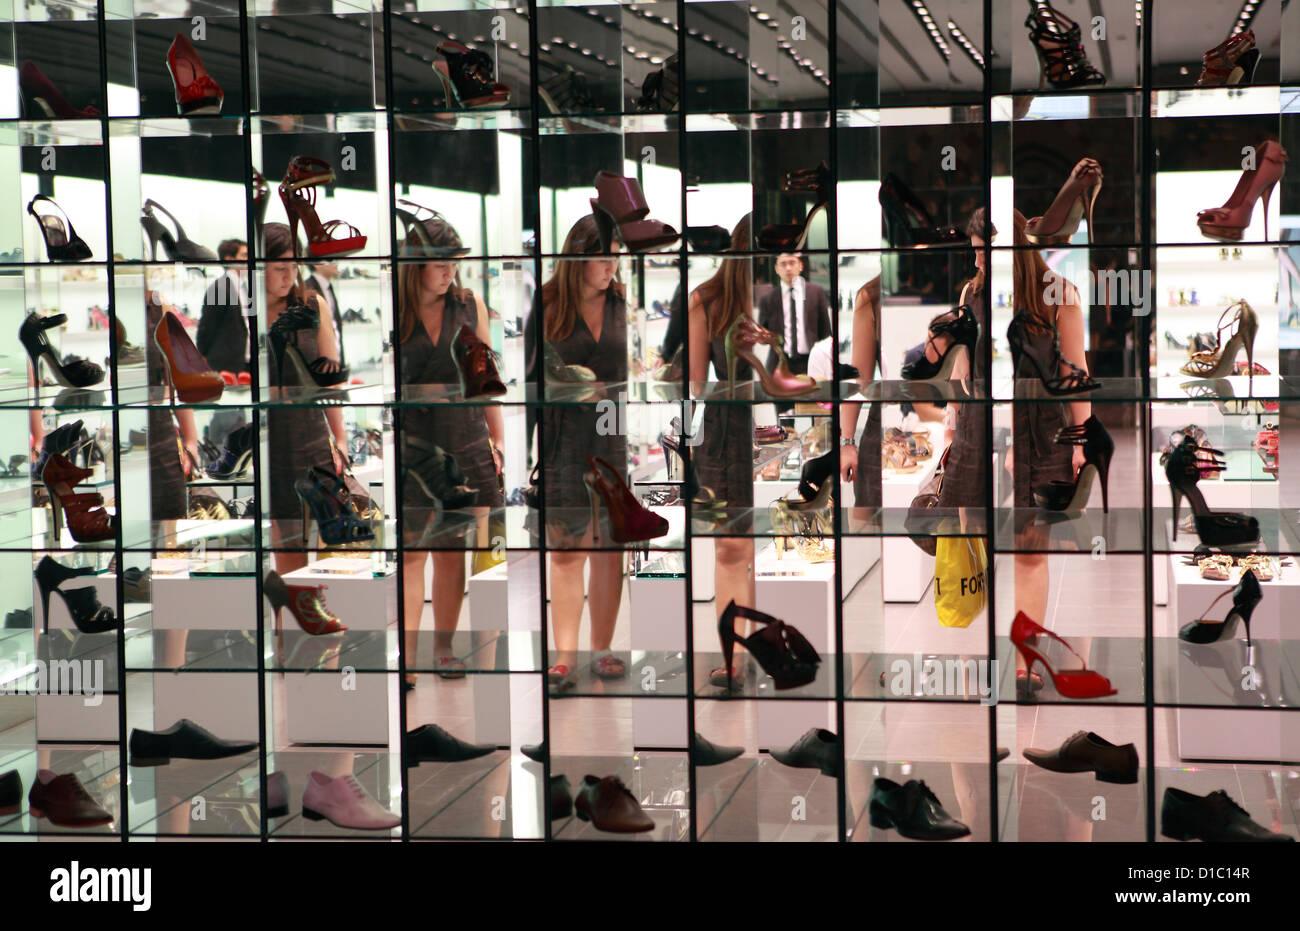 Womens Shoe Display Shop Stock Photos   Womens Shoe Display Shop ... b3a38cea8e